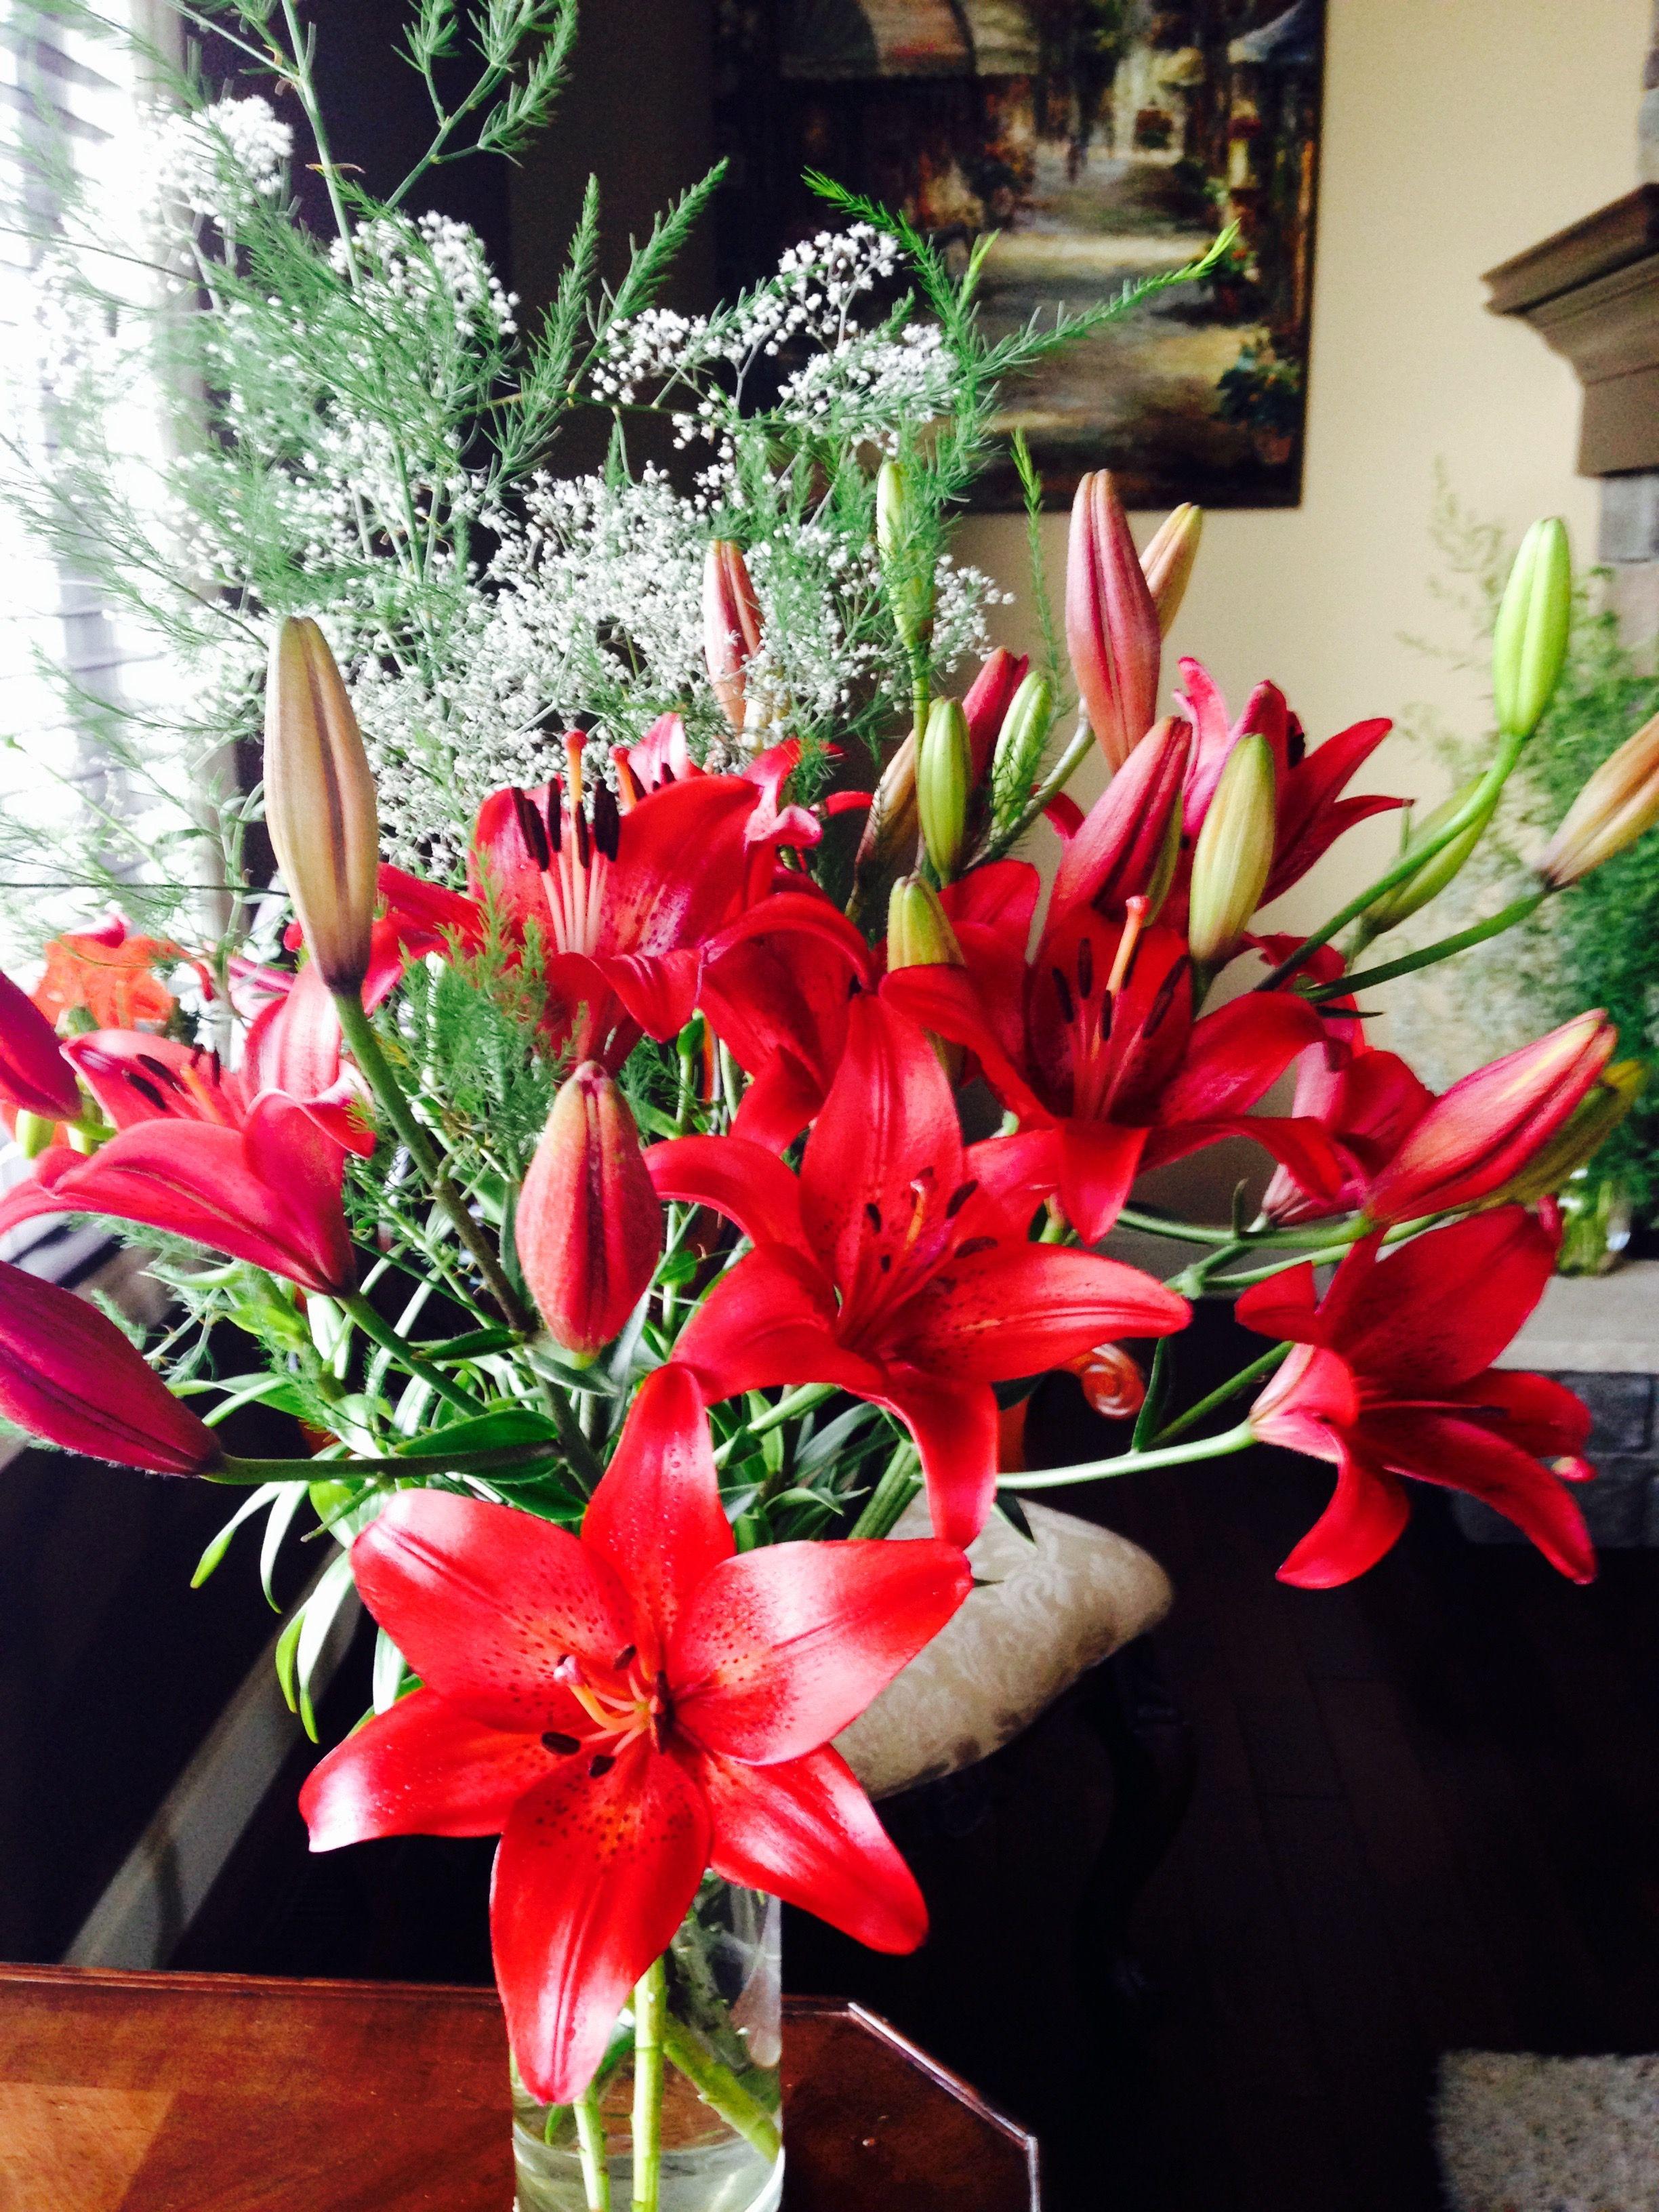 Pin By Jill Dymchuk On Wedding Flowers From Edmonton Alberta Holiday Decor Christmas Wreaths Wedding Flowers